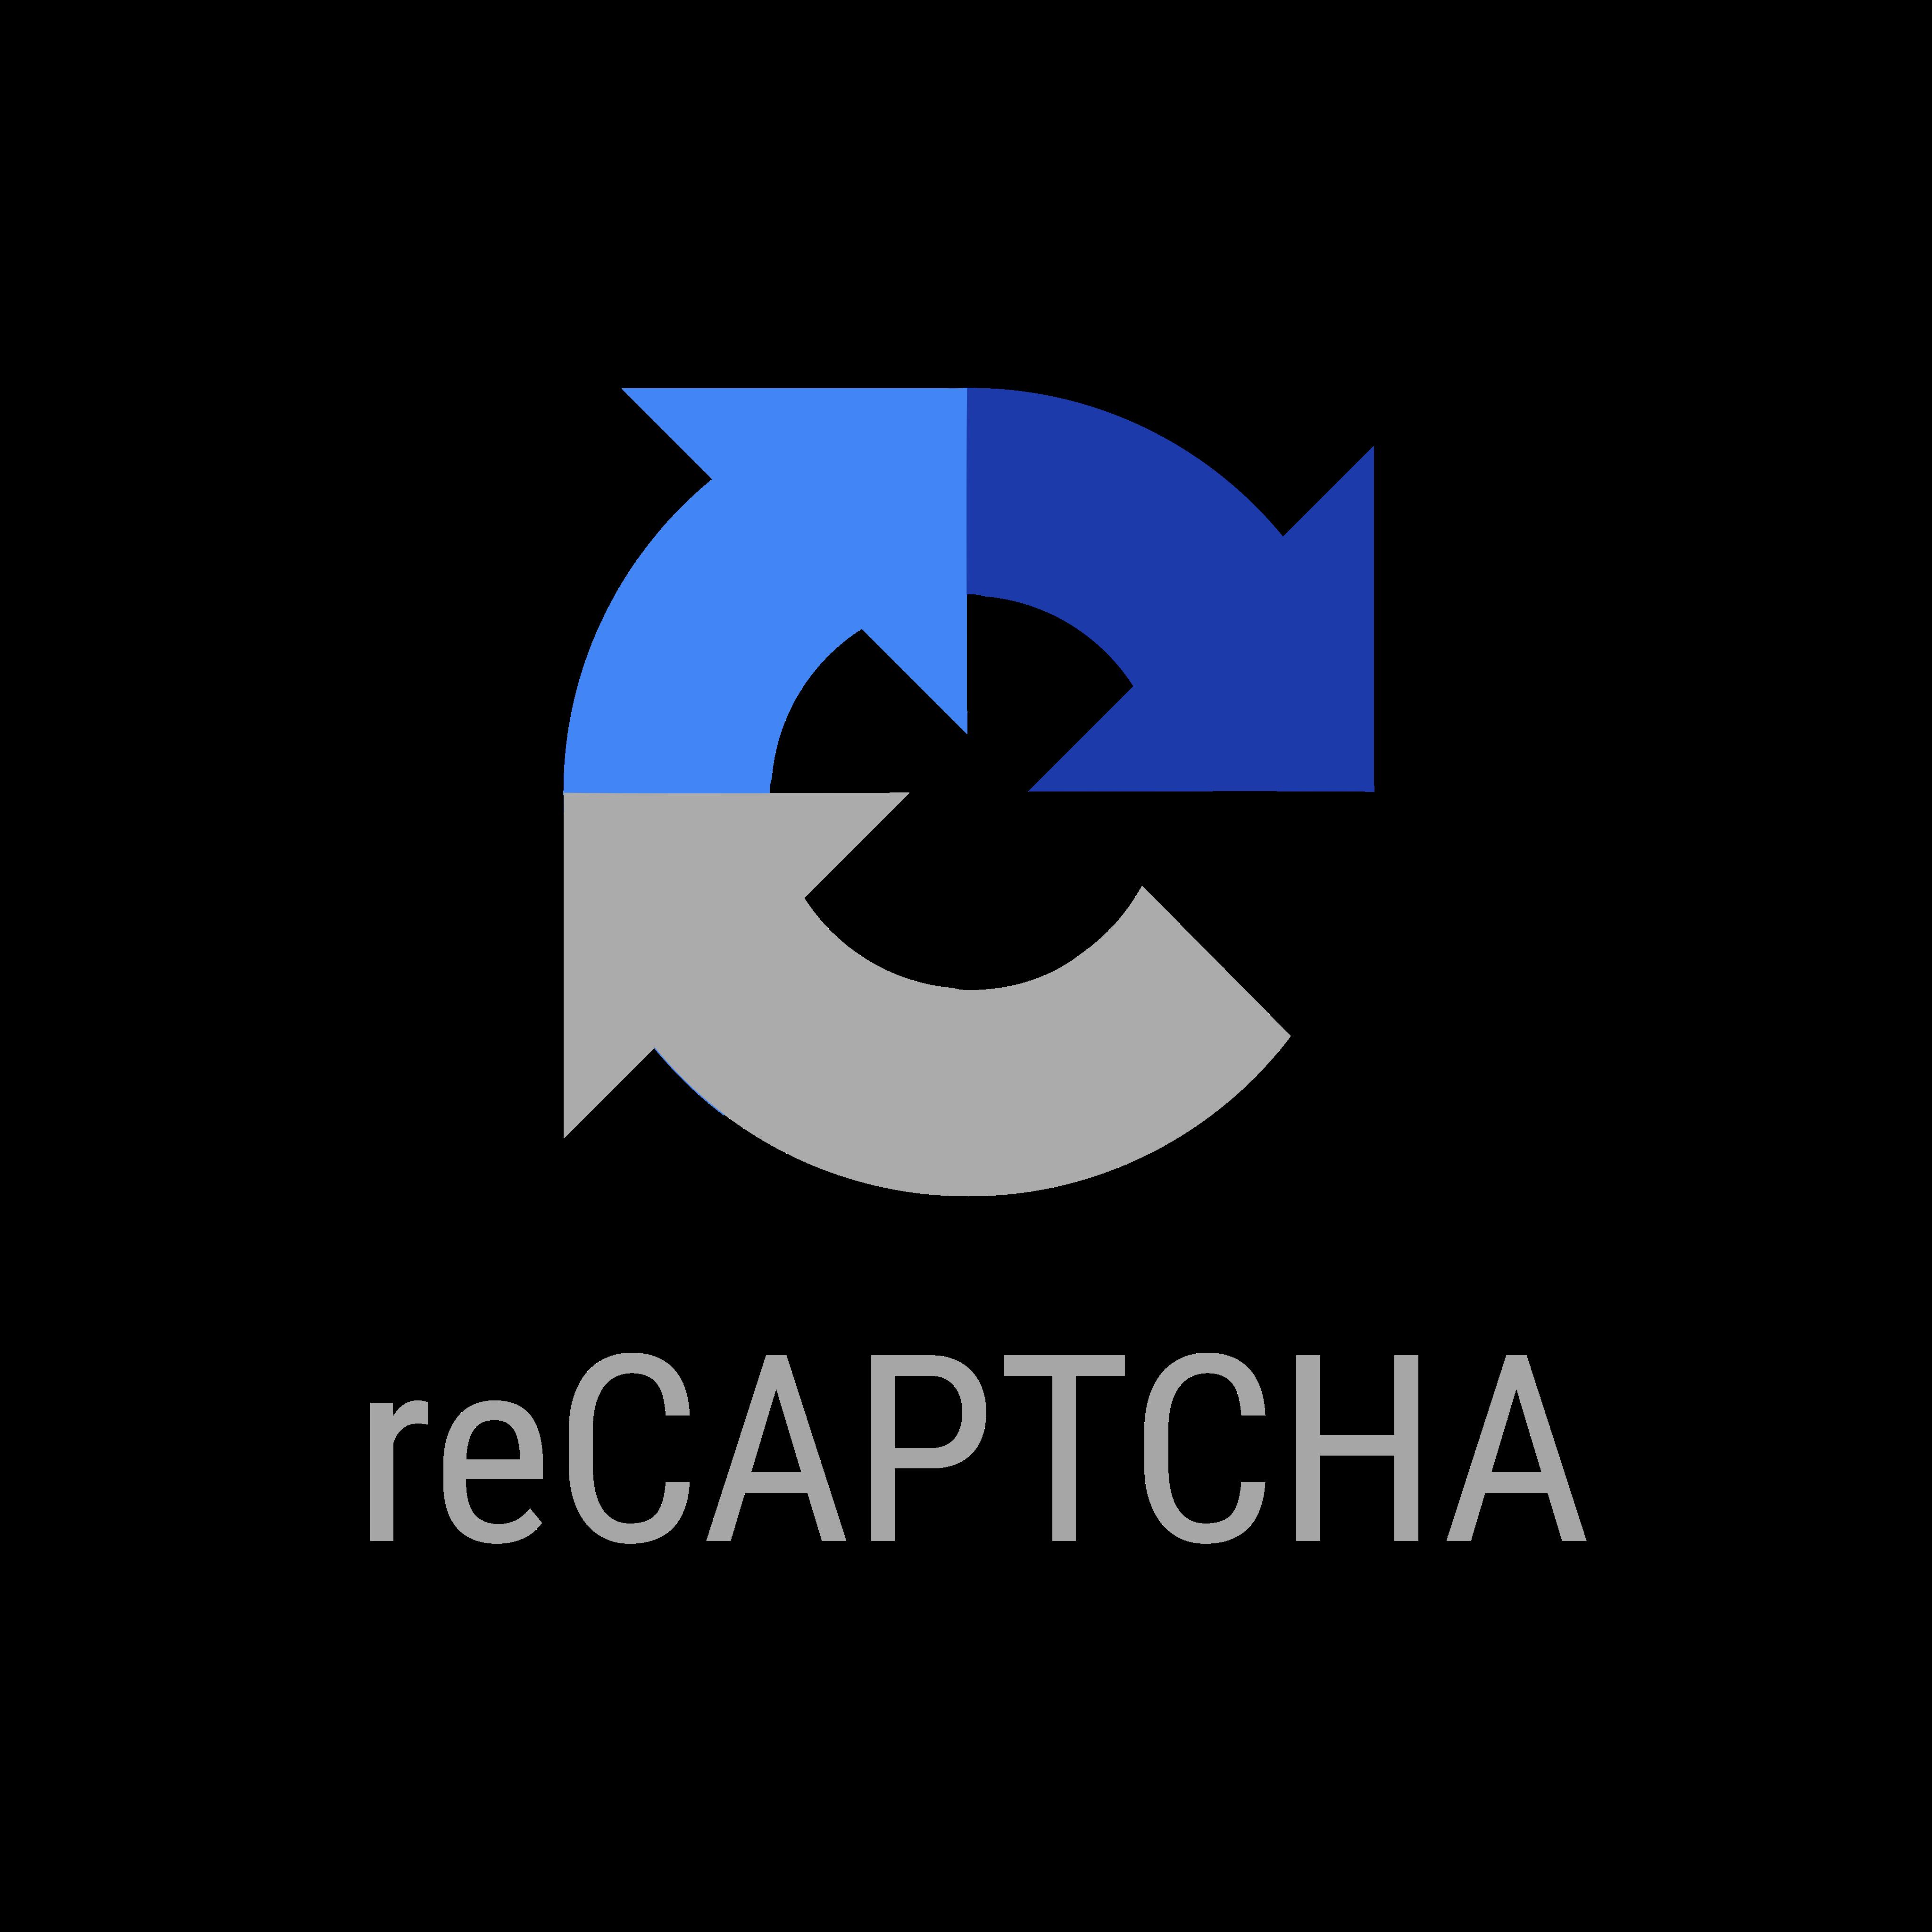 recaptcha logo 0 - reCAPTCHA Logo